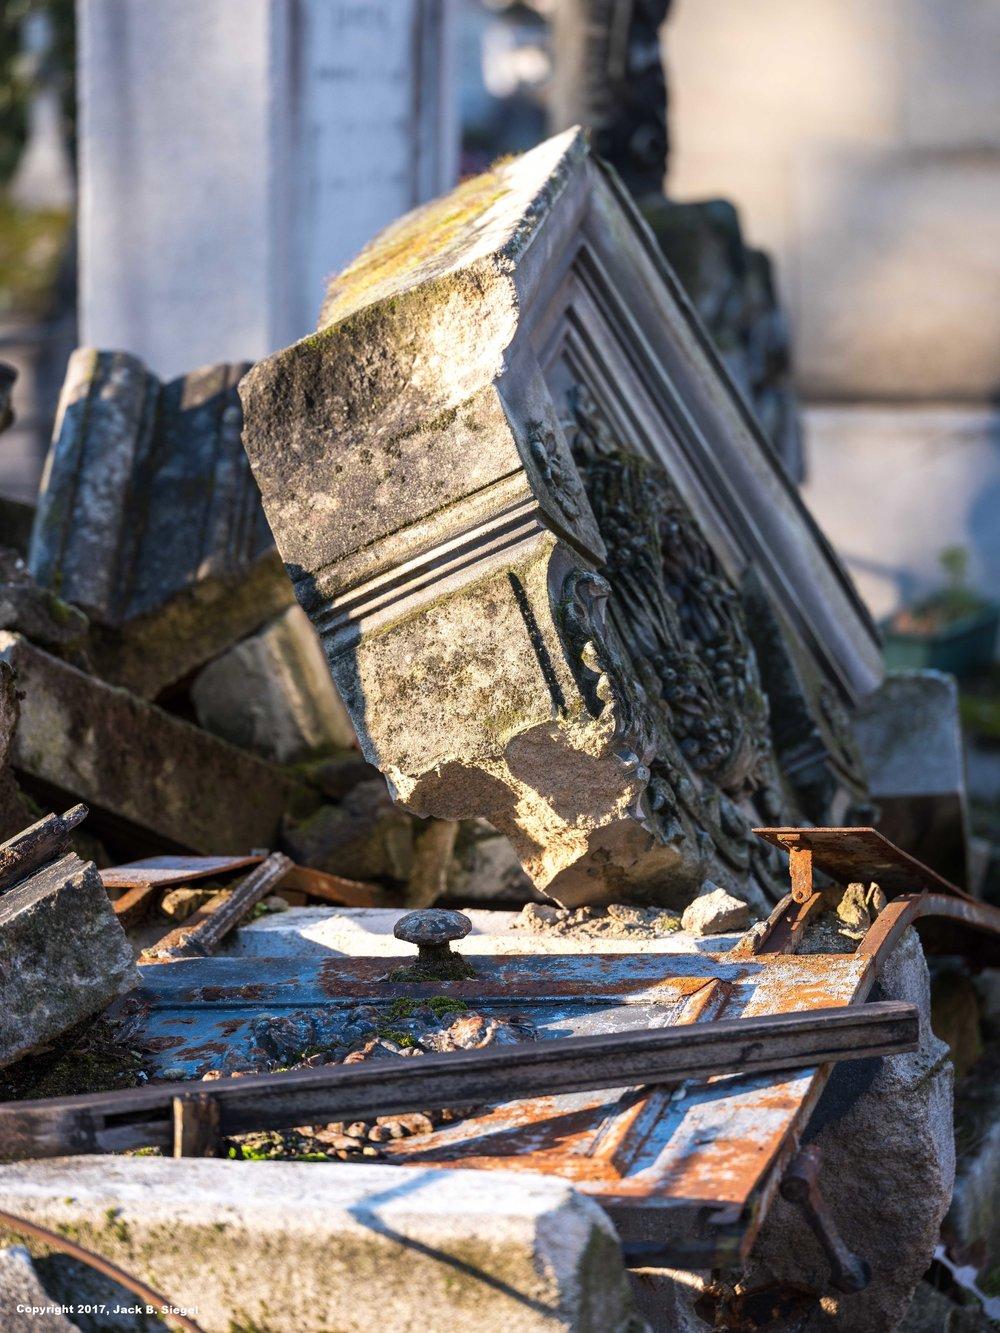 _DSF5462_Copyright_sRGB_Relative_Cemetery Decay.jpg